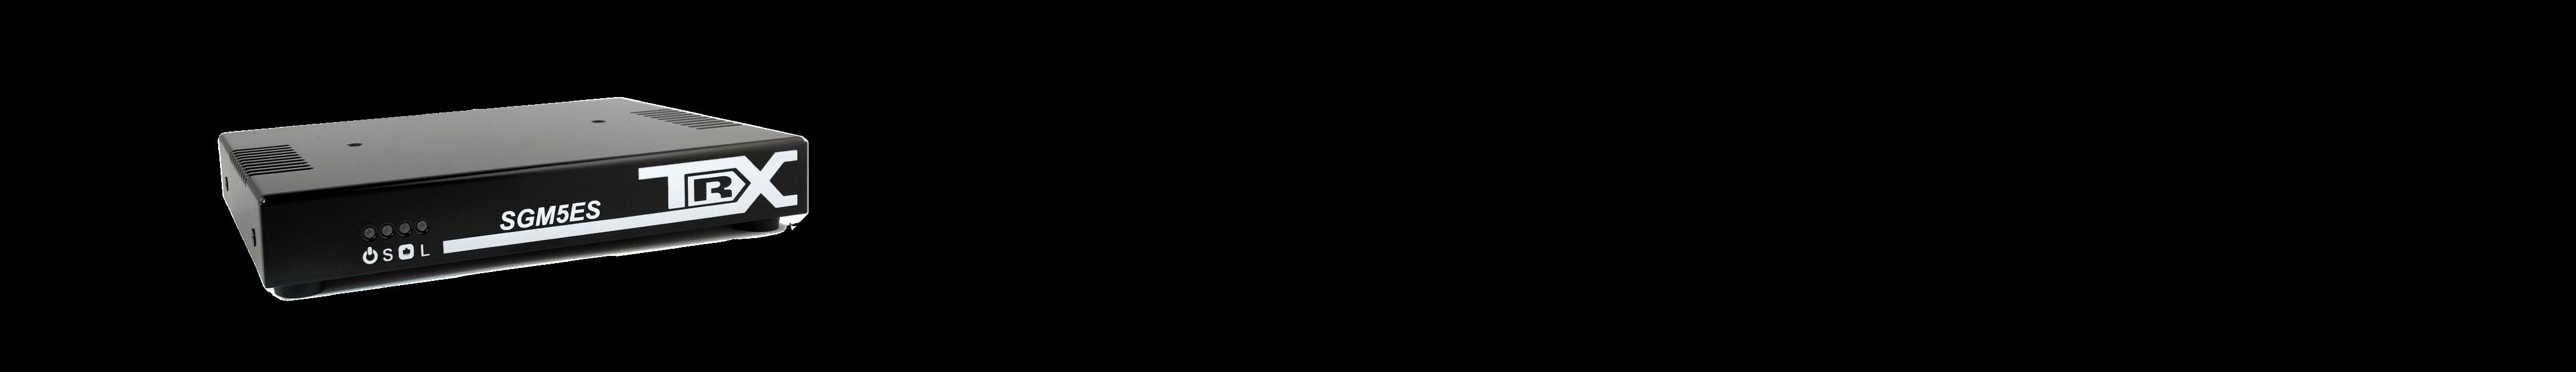 TRX SGM5ES slider